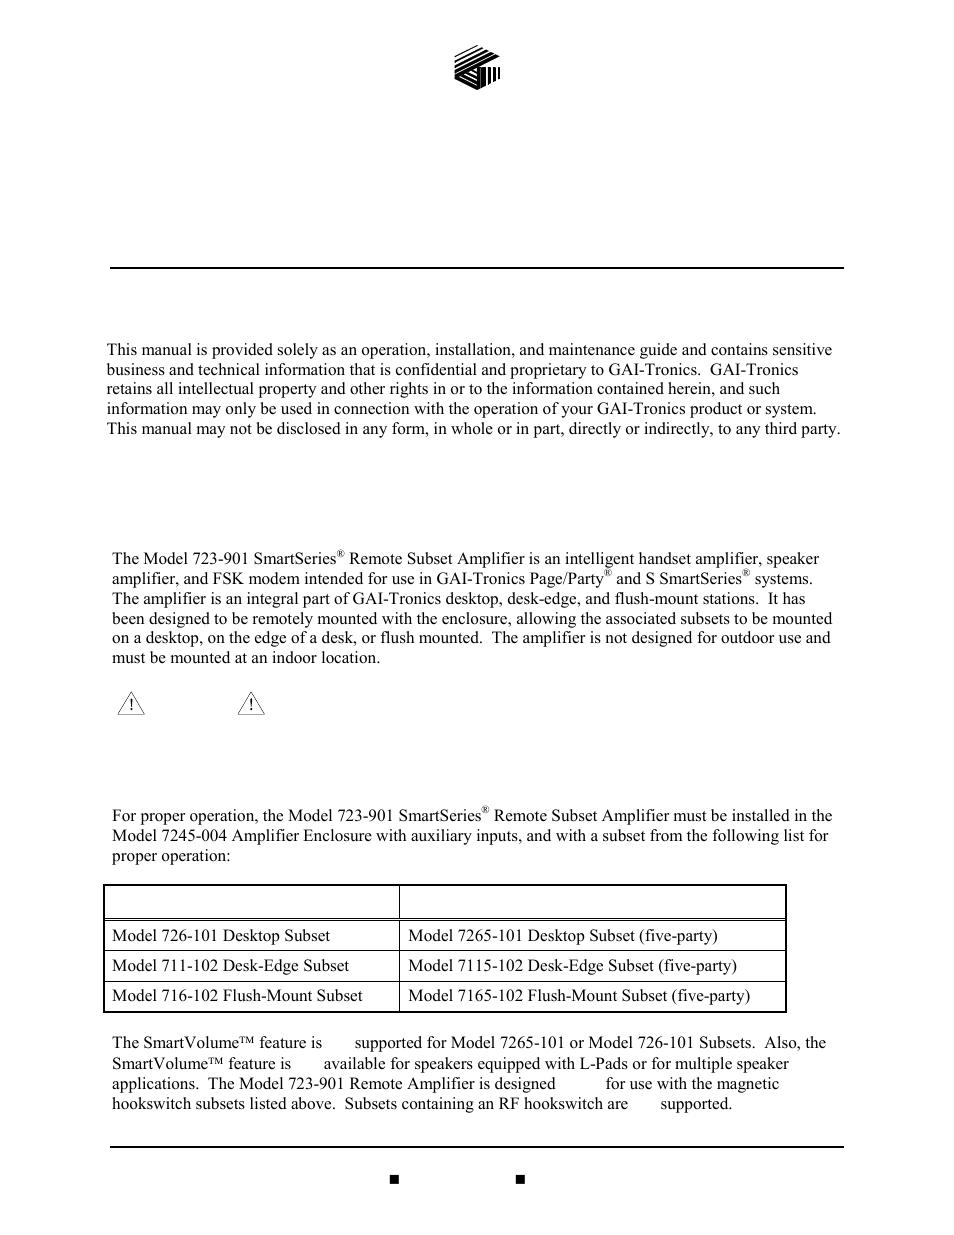 GAI-Tronics 723-901 SmartSeries Remote Subset Amplifier User Manual